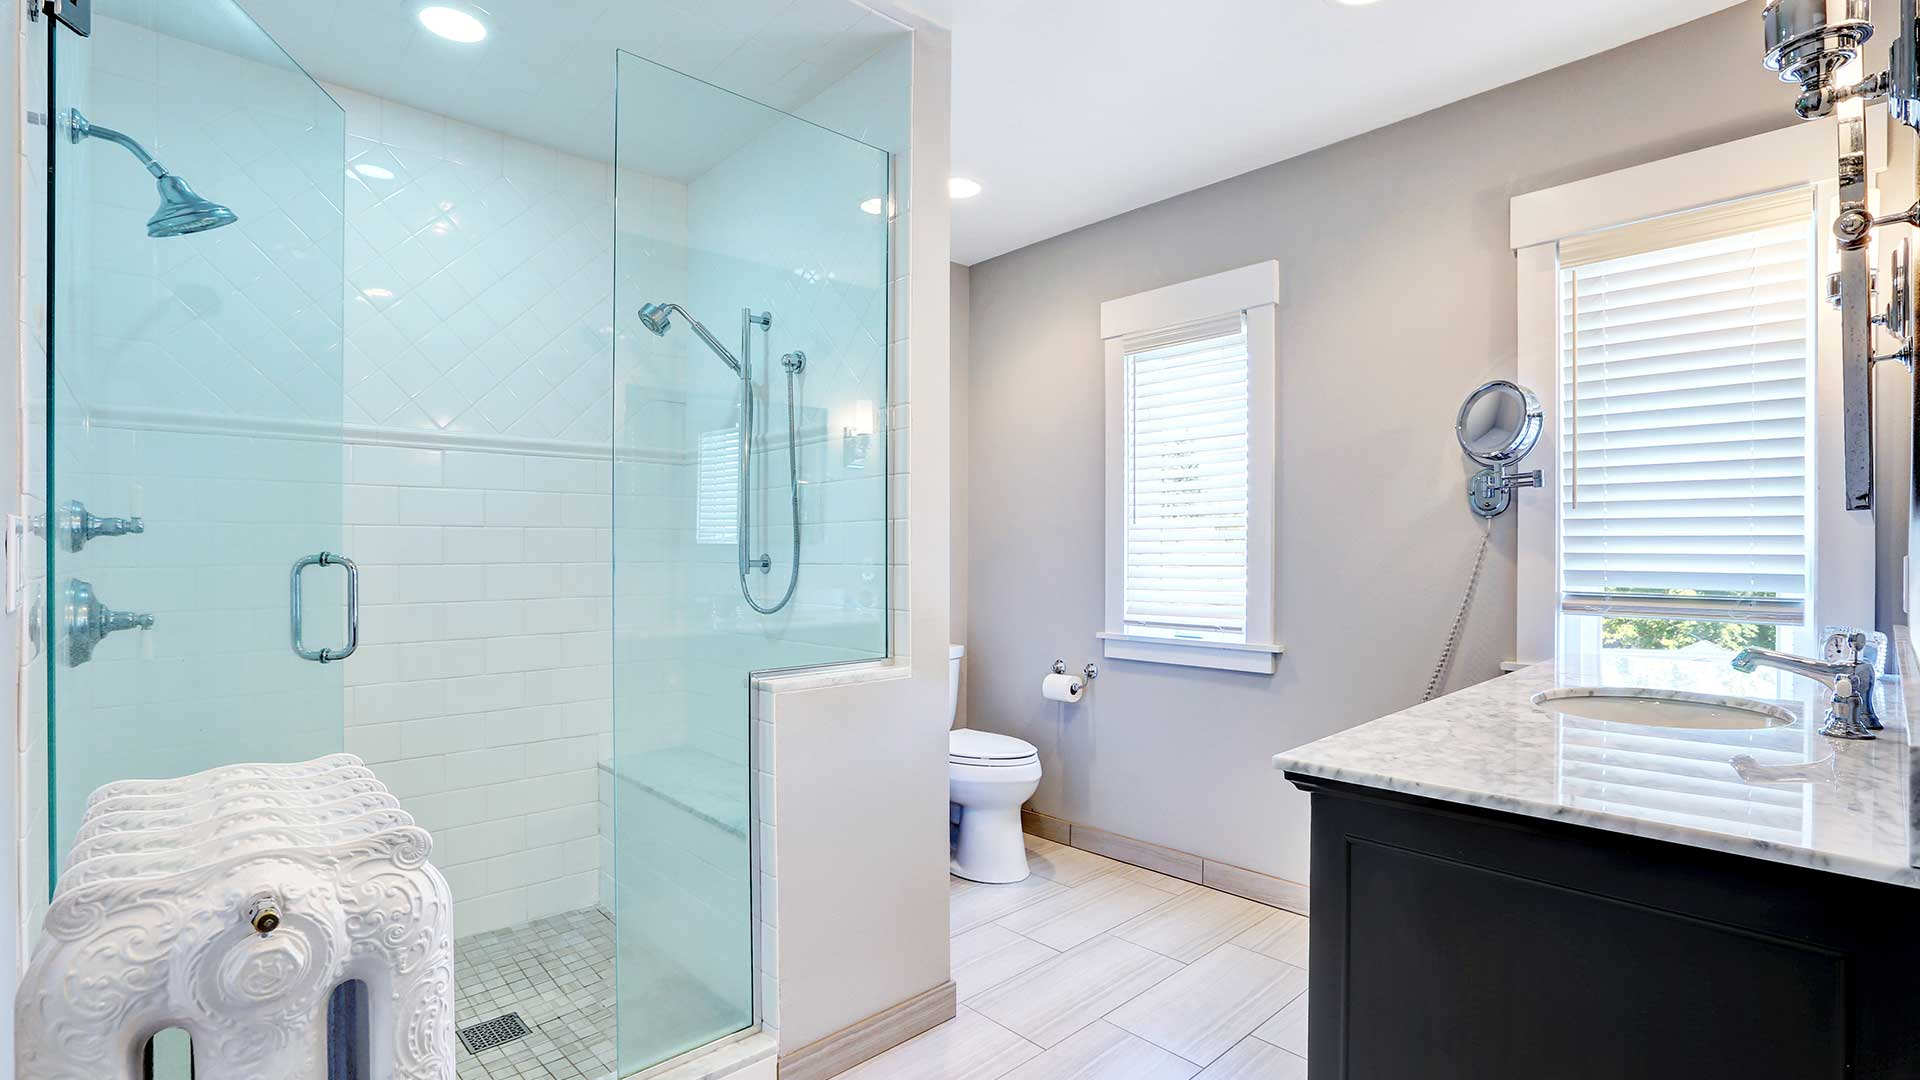 Salle de bain moderne et douche en verre